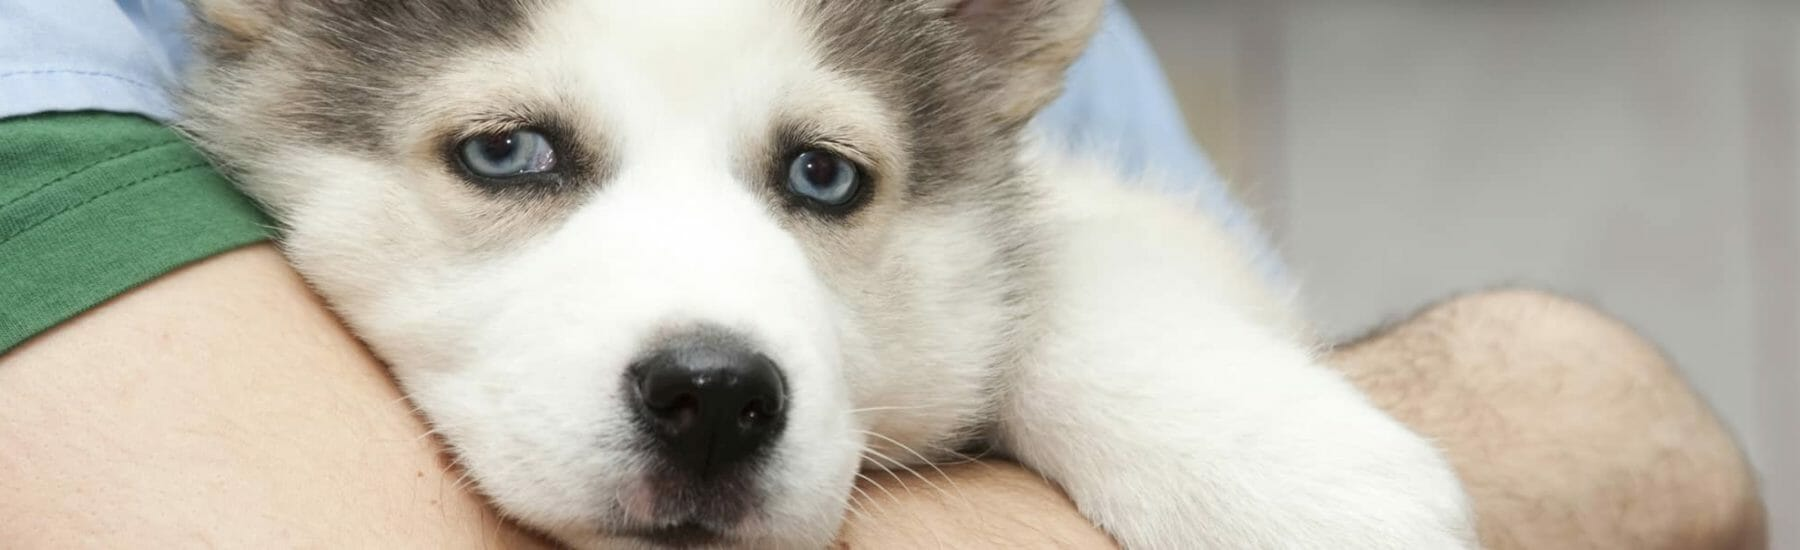 Husky being held by owner